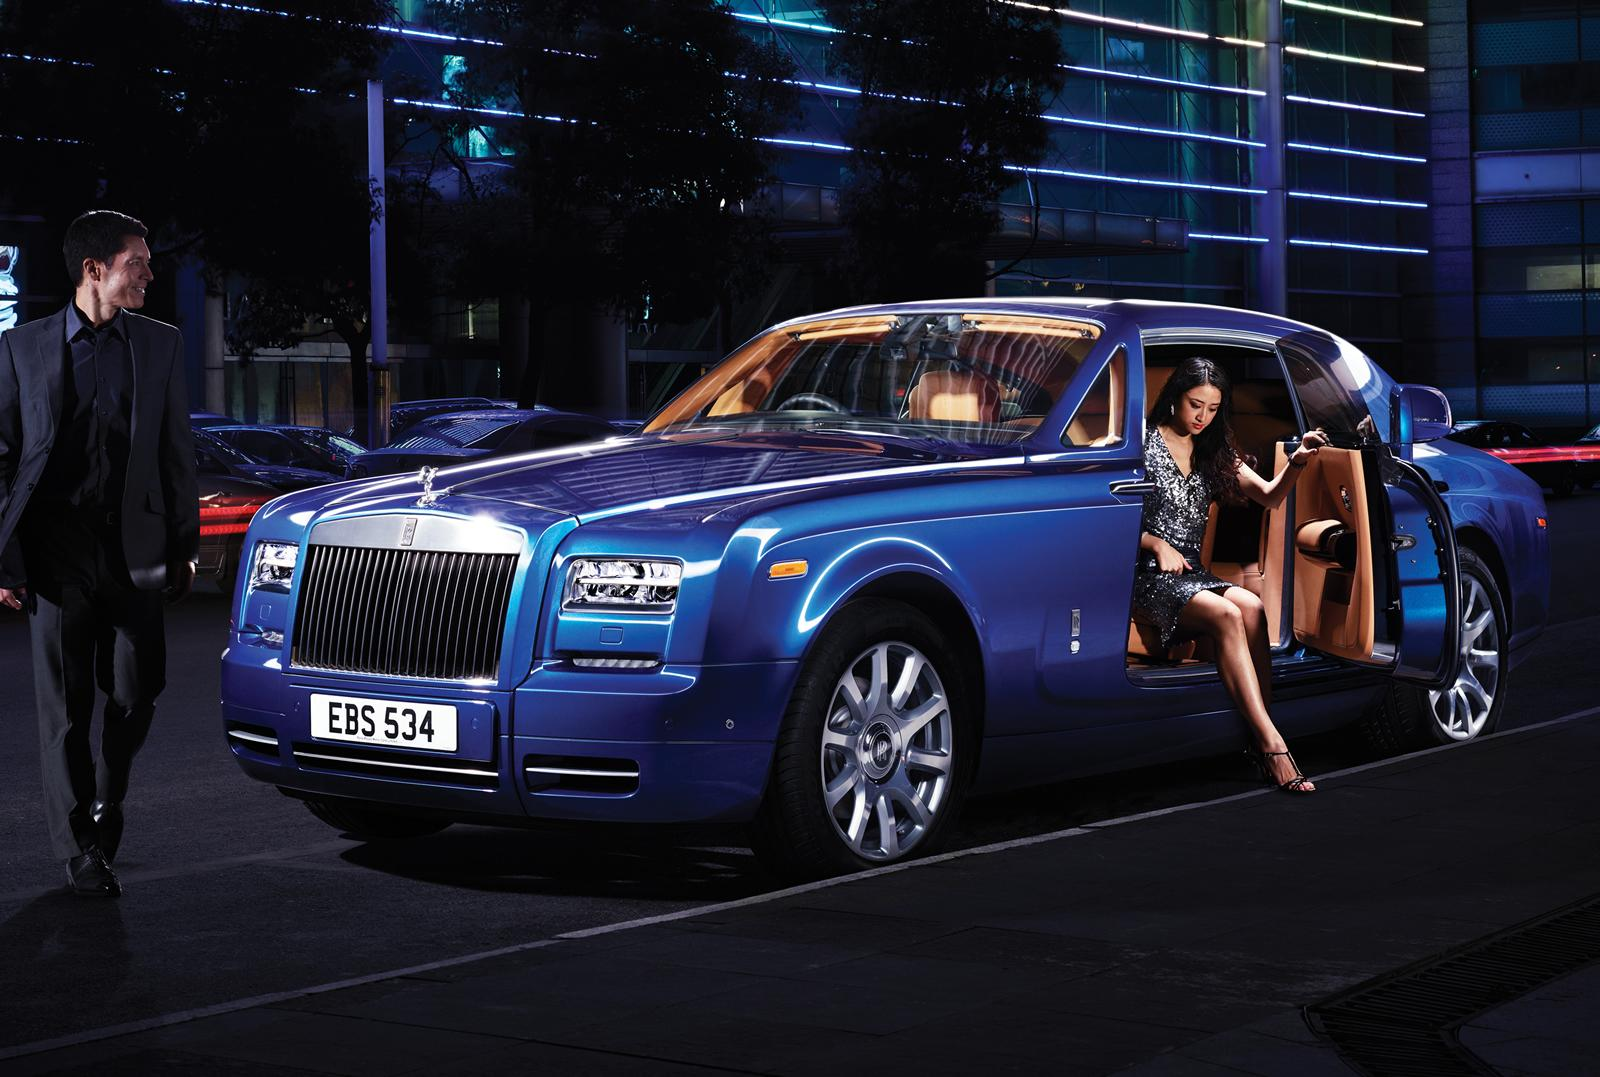 Rolls Royce Phantom Series II Wallpaper Free For PC